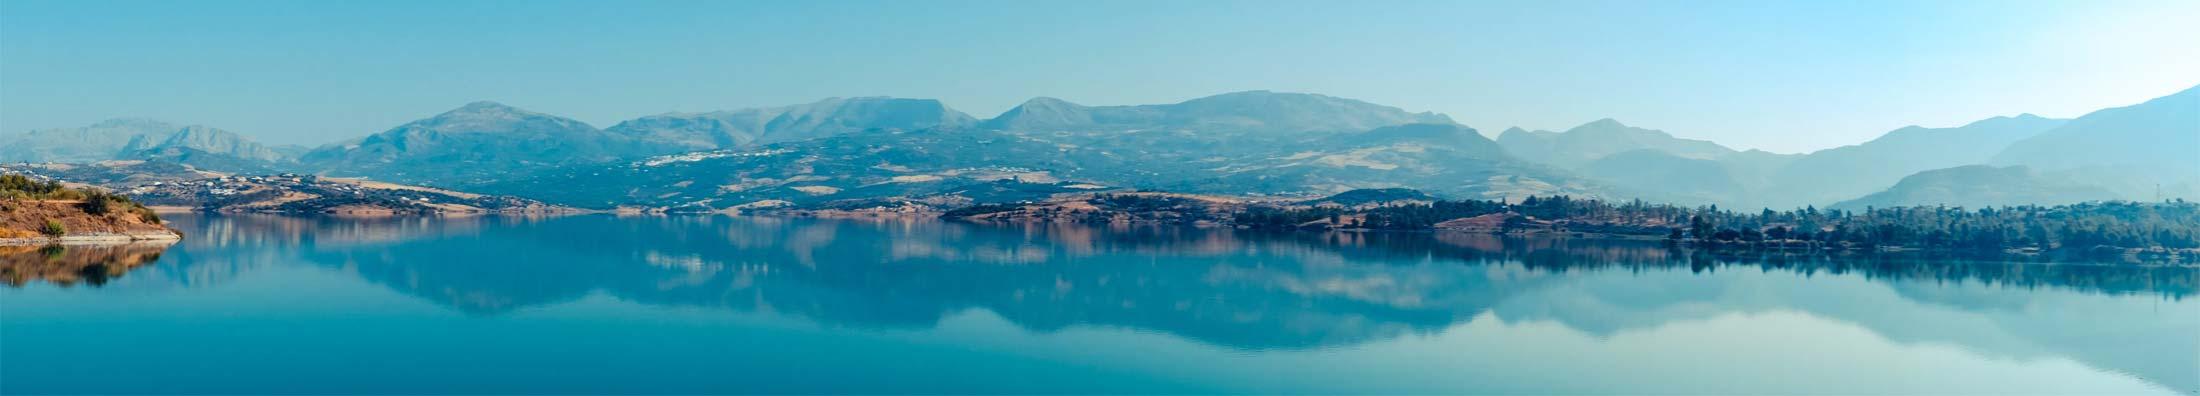 Beste Bed and Breakfast - B&B Los Montes - Andalusië - Málaga - Viñuela - hoofding